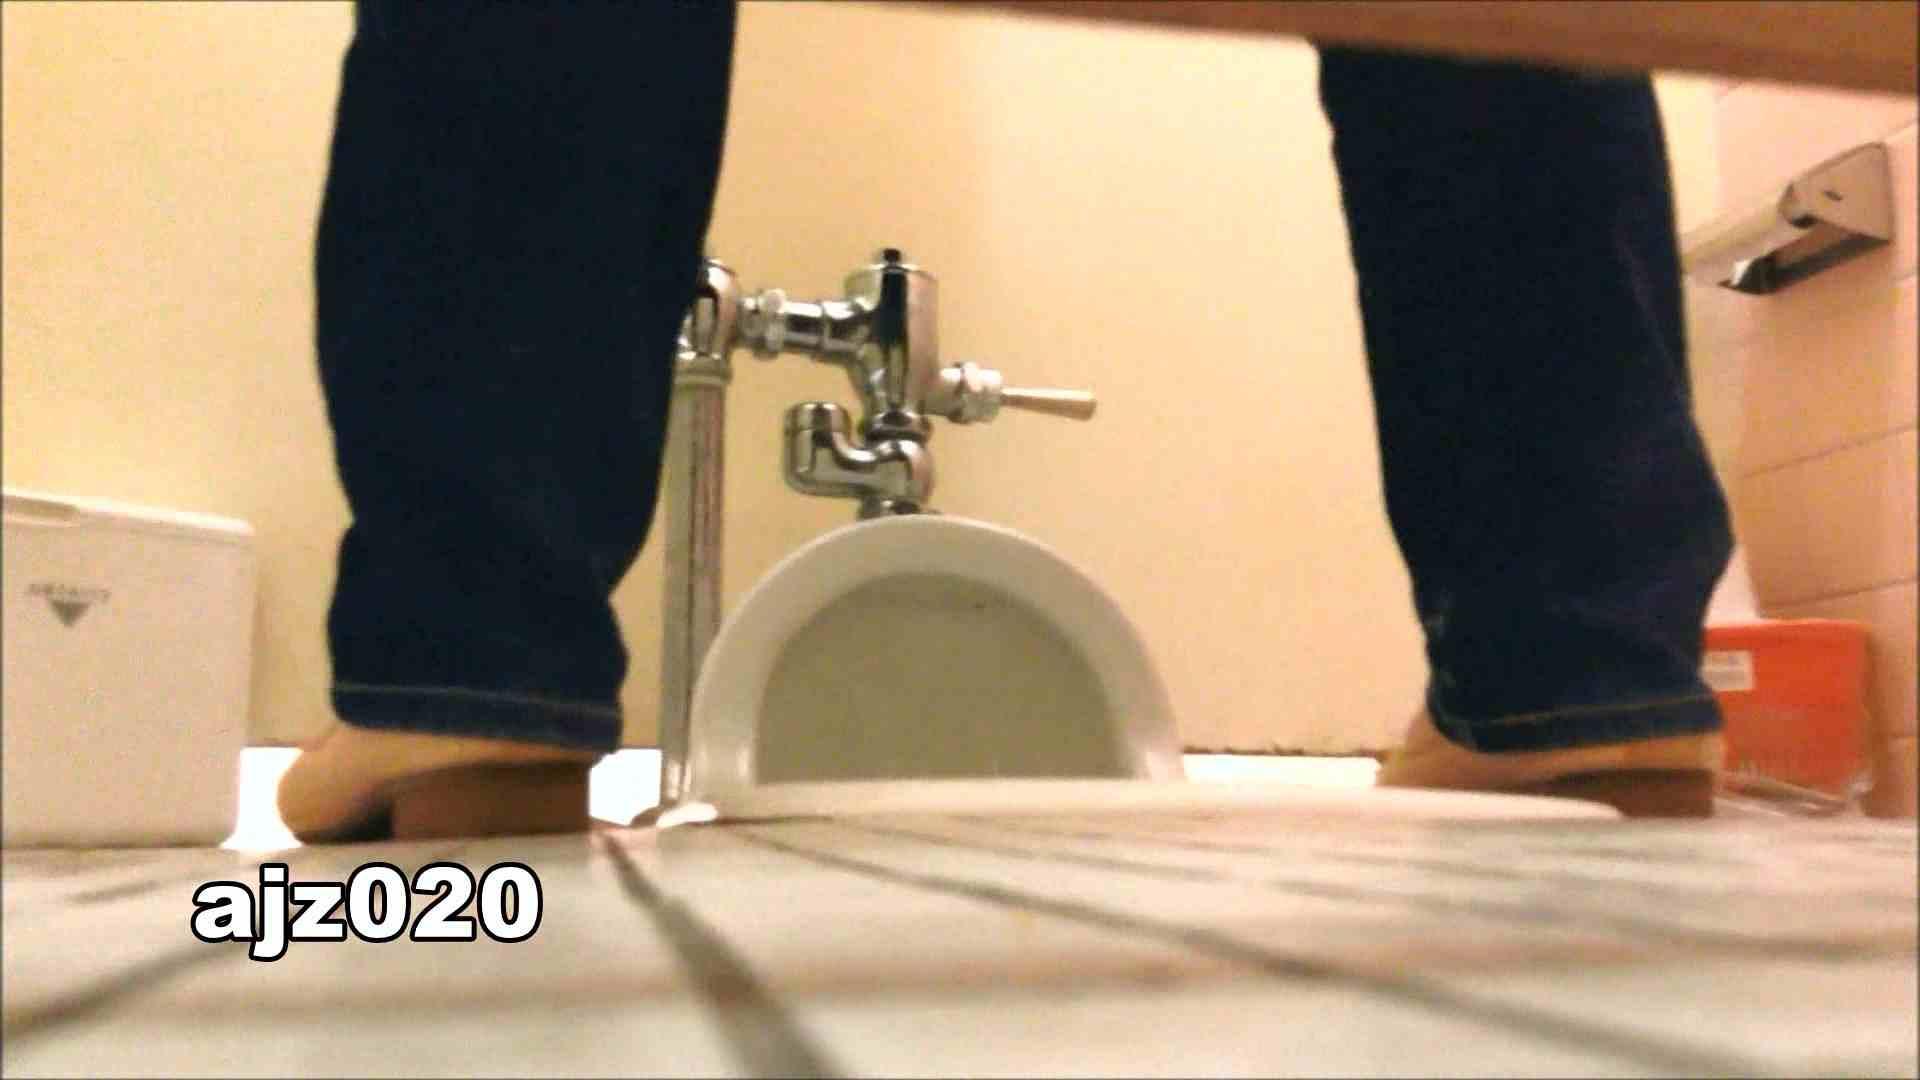 某有名大学女性洗面所 vol.20 排泄 AV動画キャプチャ 101枚 87